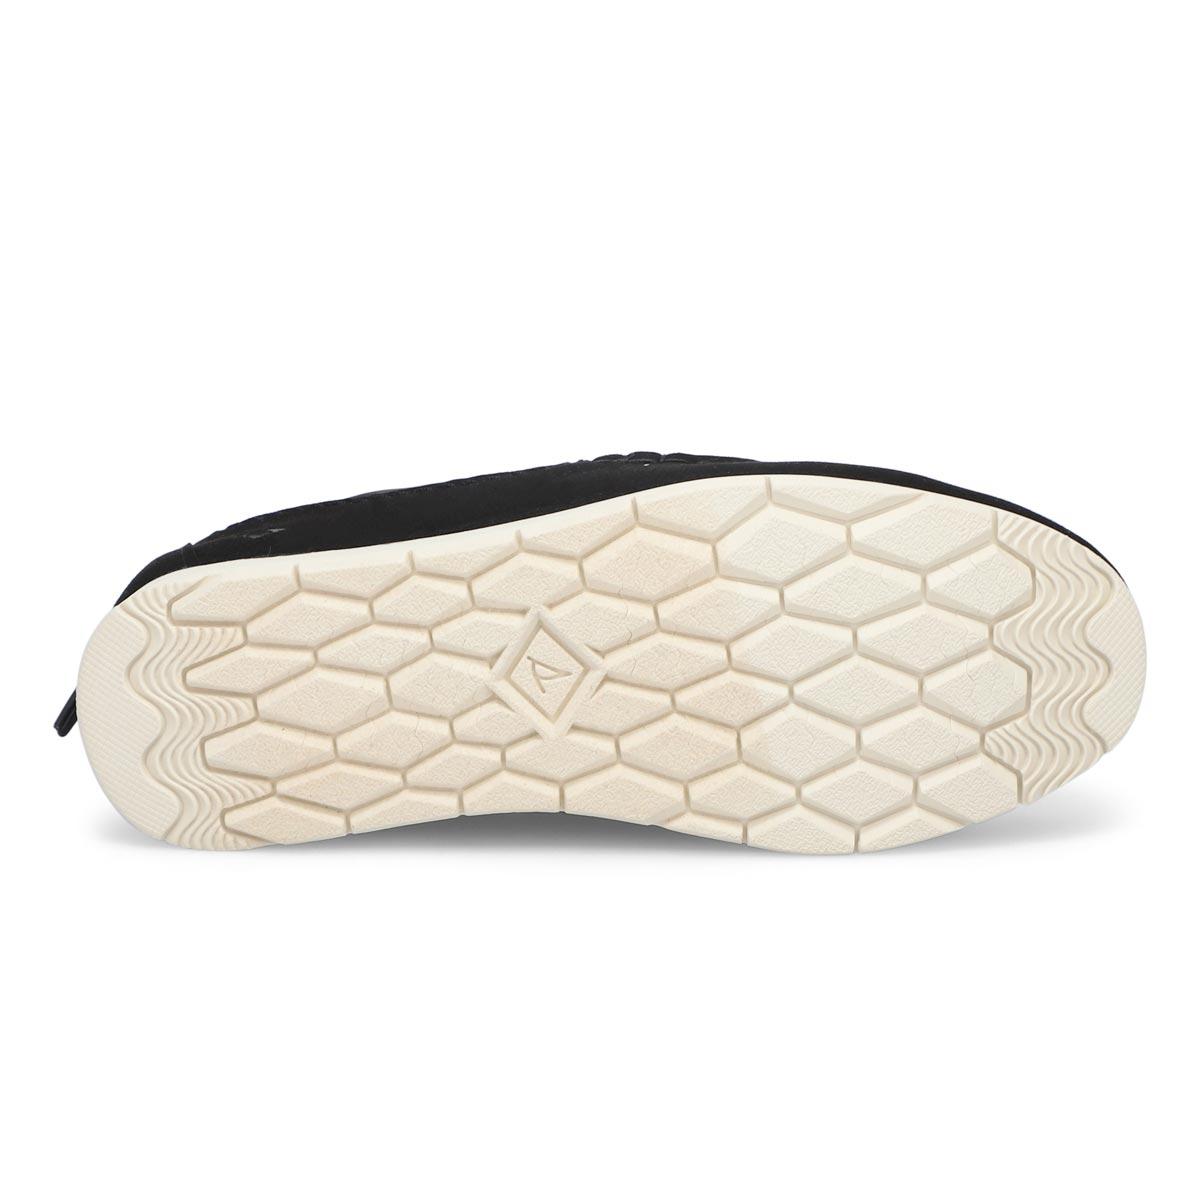 Women's Moc-Sider Slip On Shoe - Black